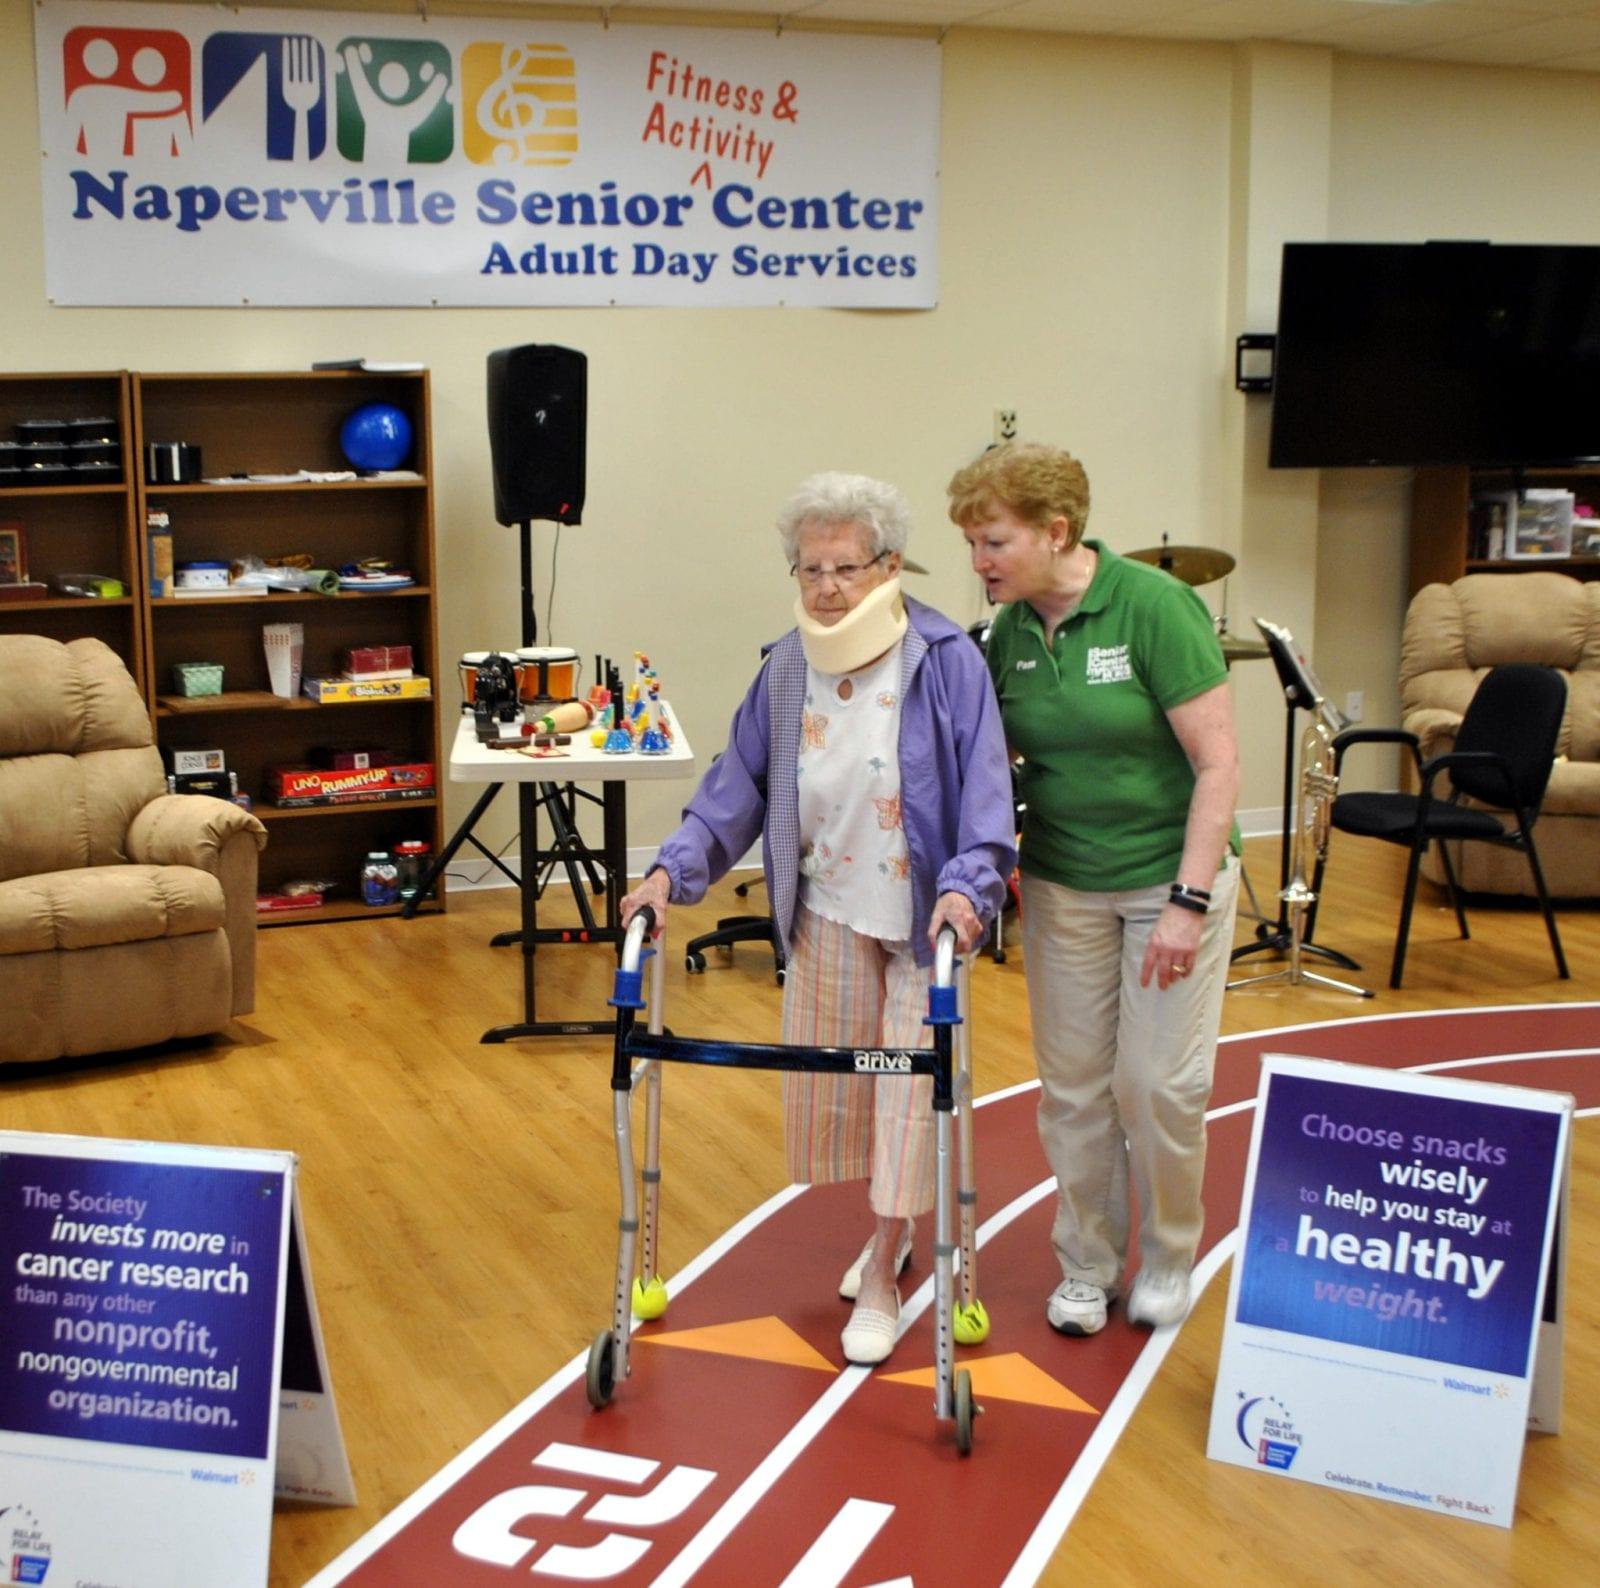 Senior Adult Center 75